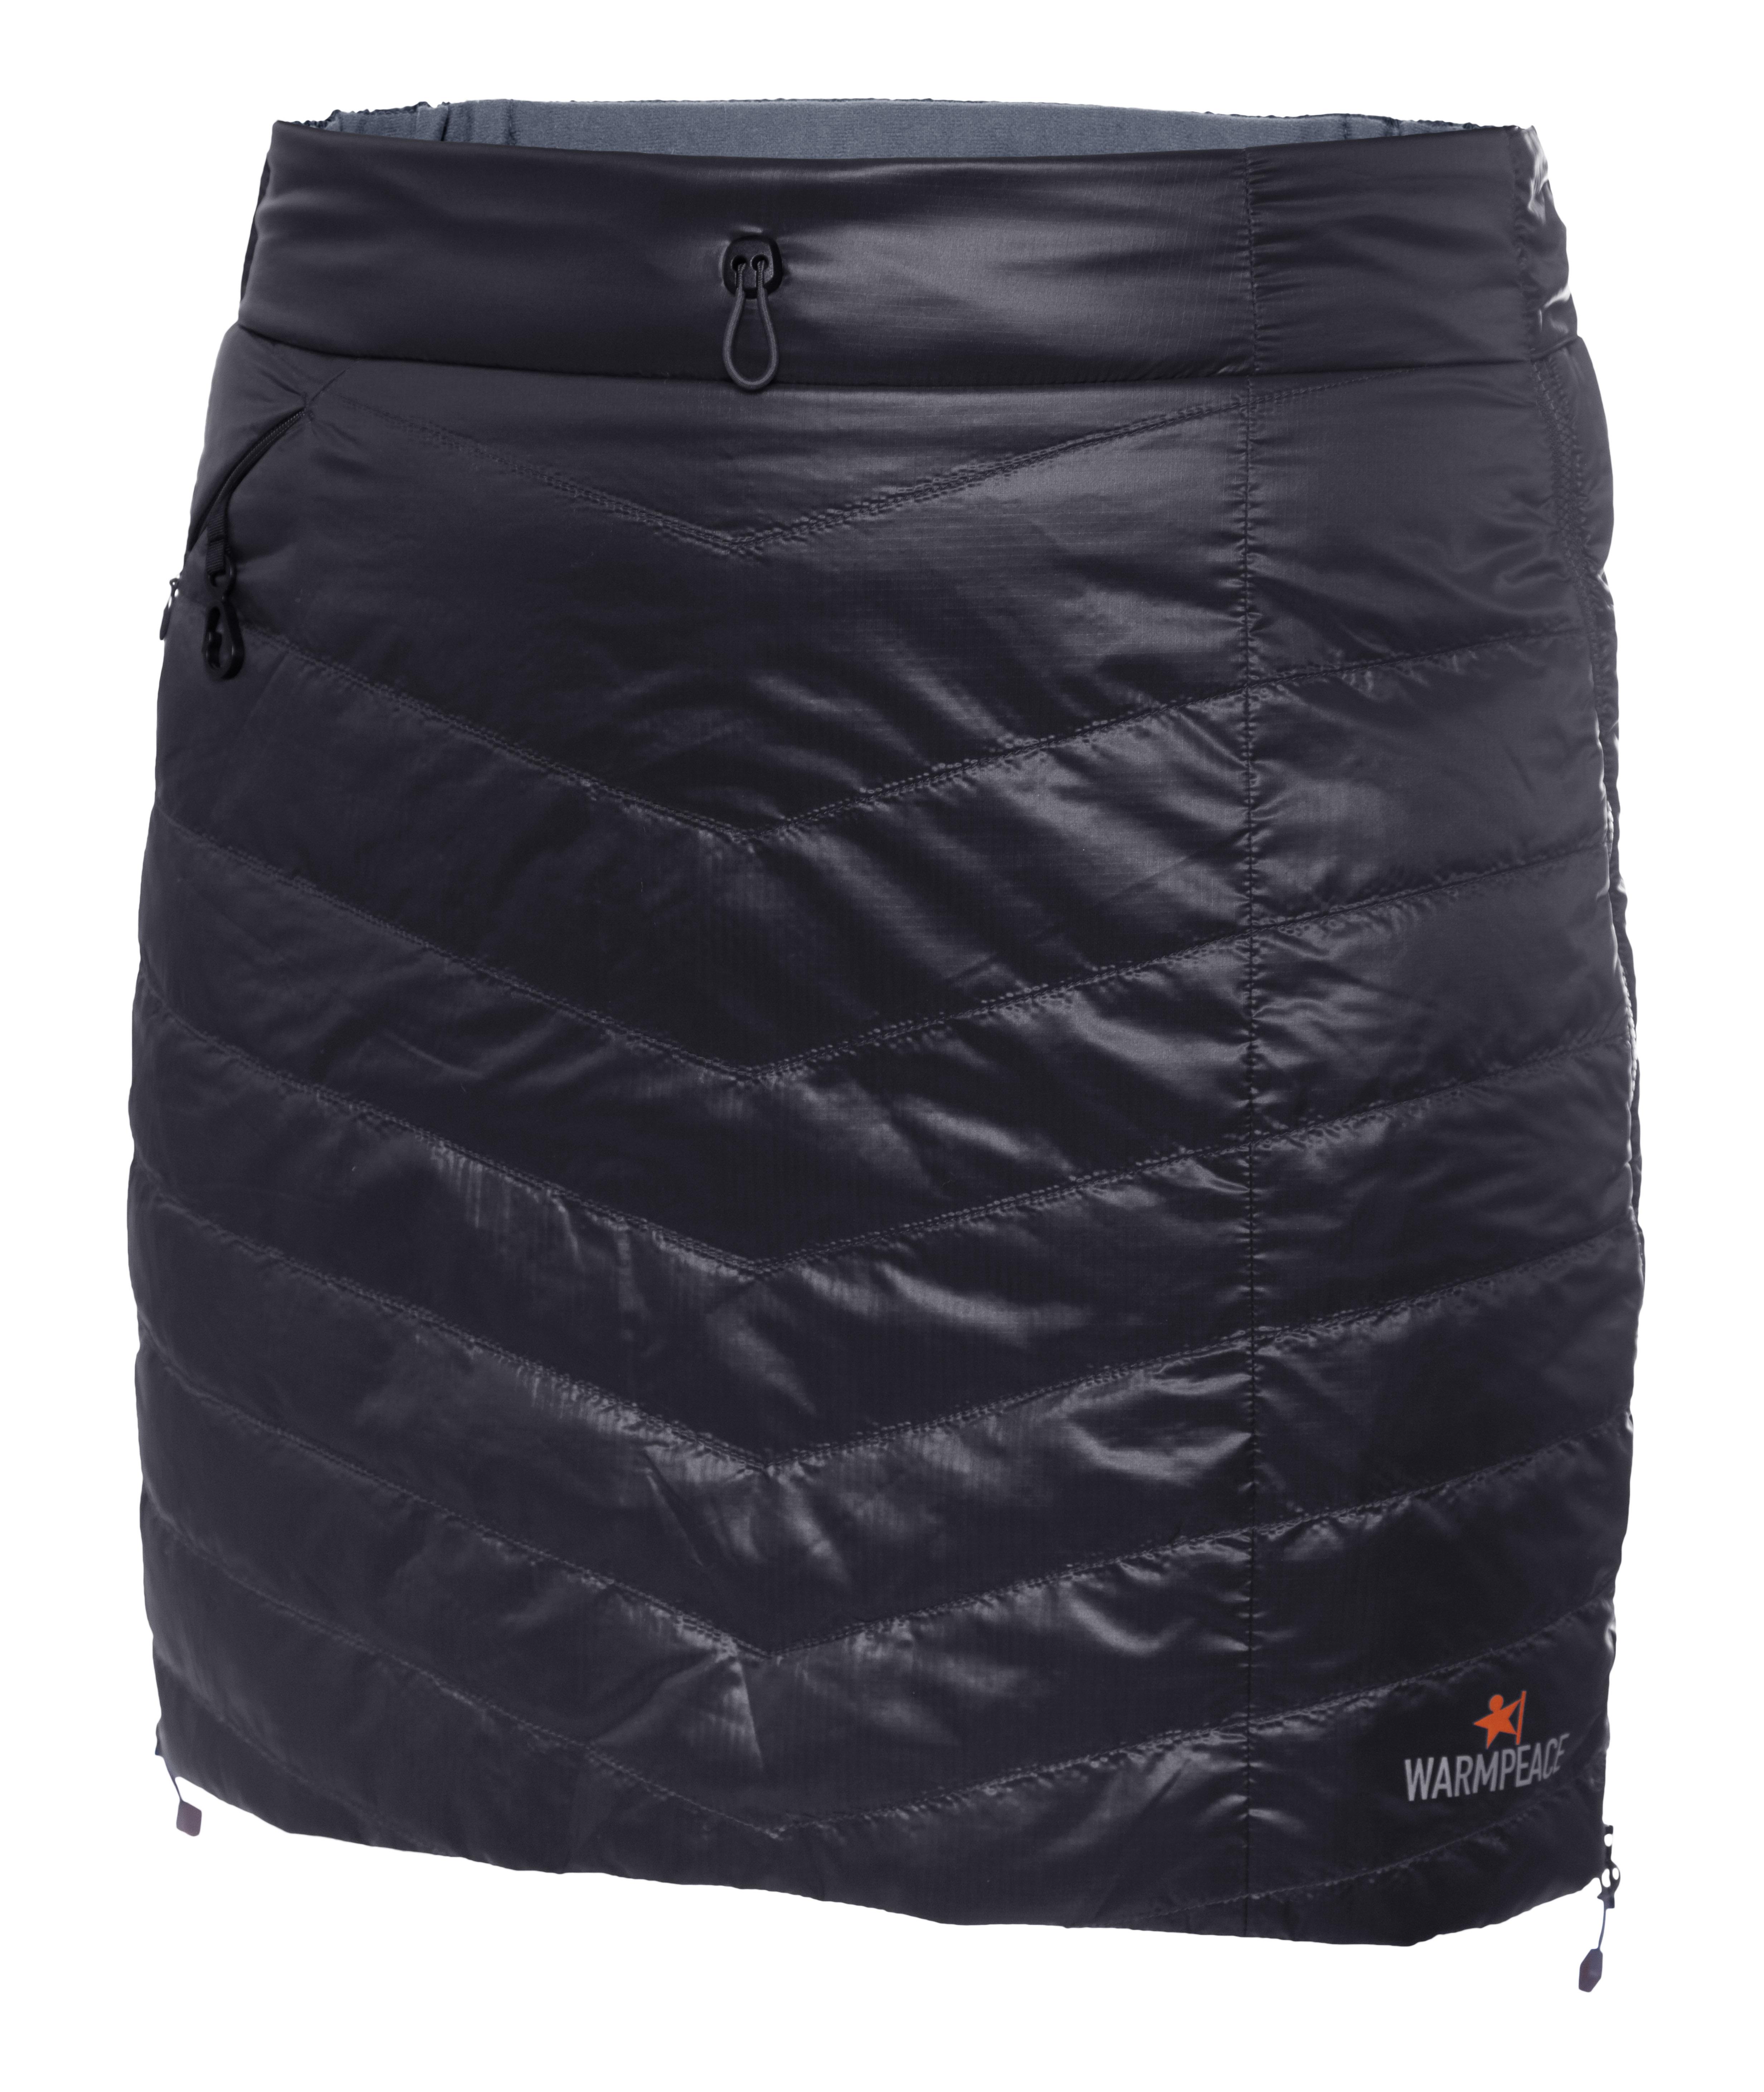 Warmpeace Shee Skirt padded